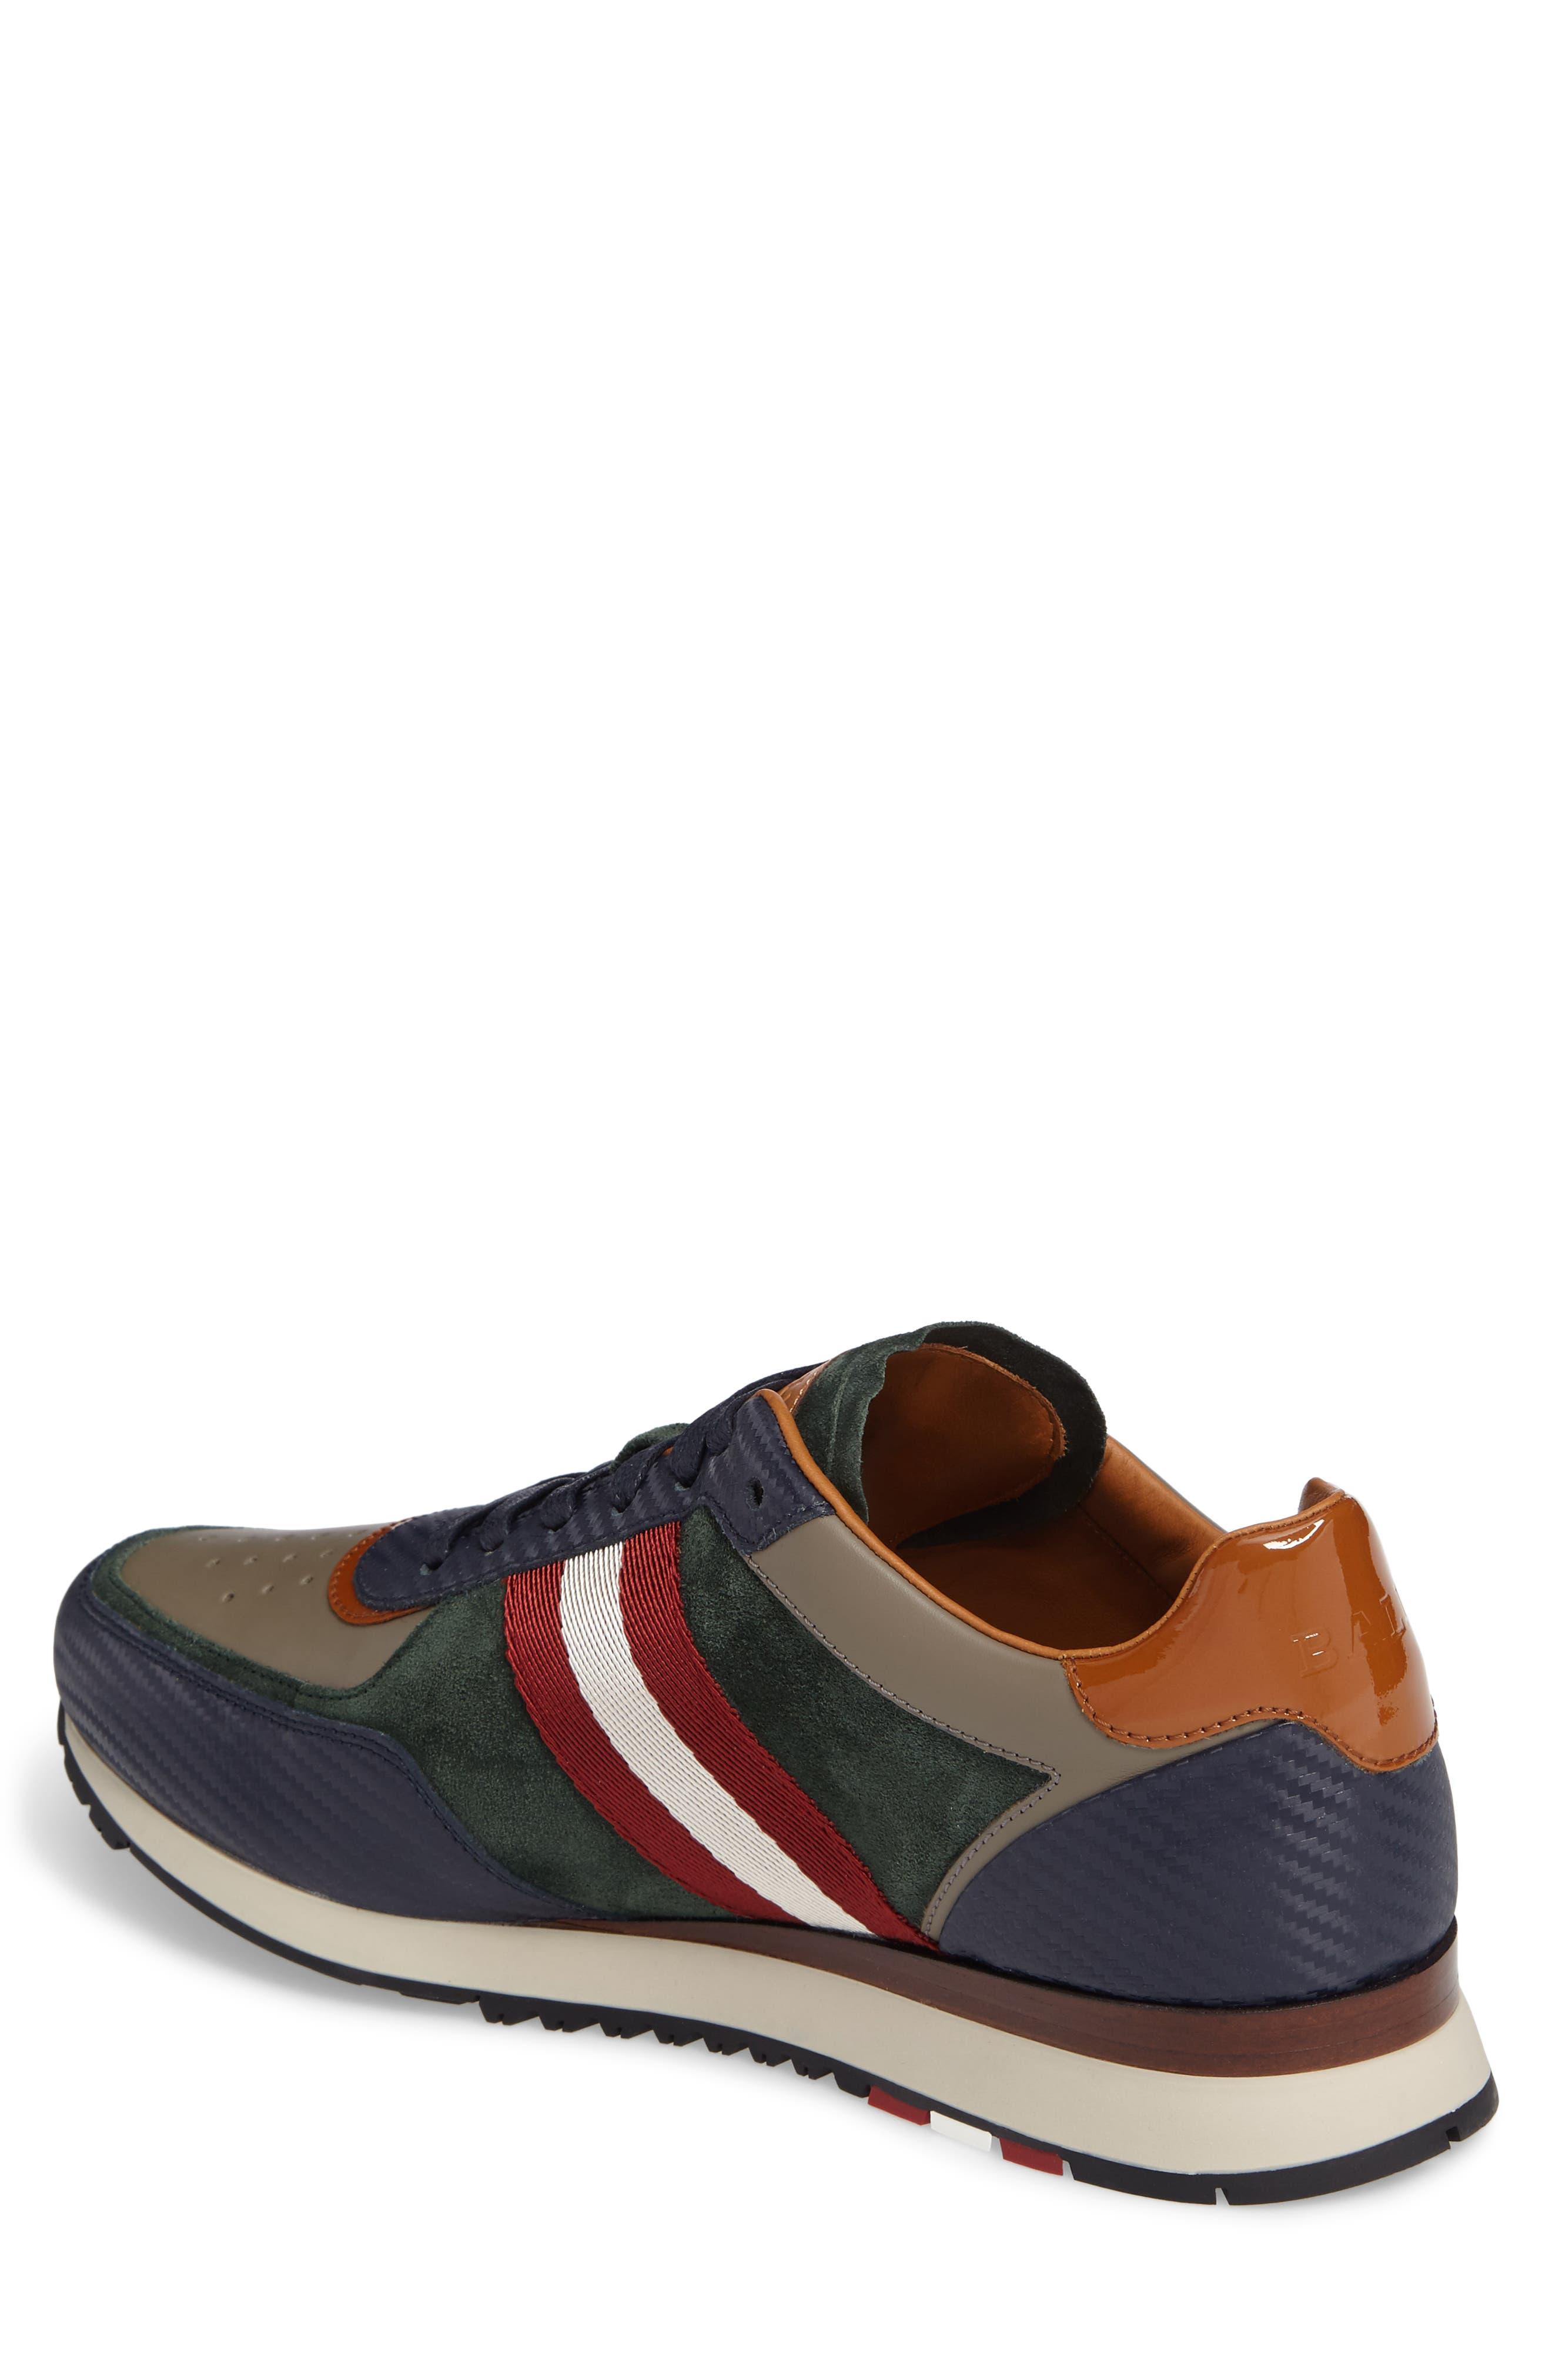 Aston Sneaker,                             Alternate thumbnail 5, color,                             Ink